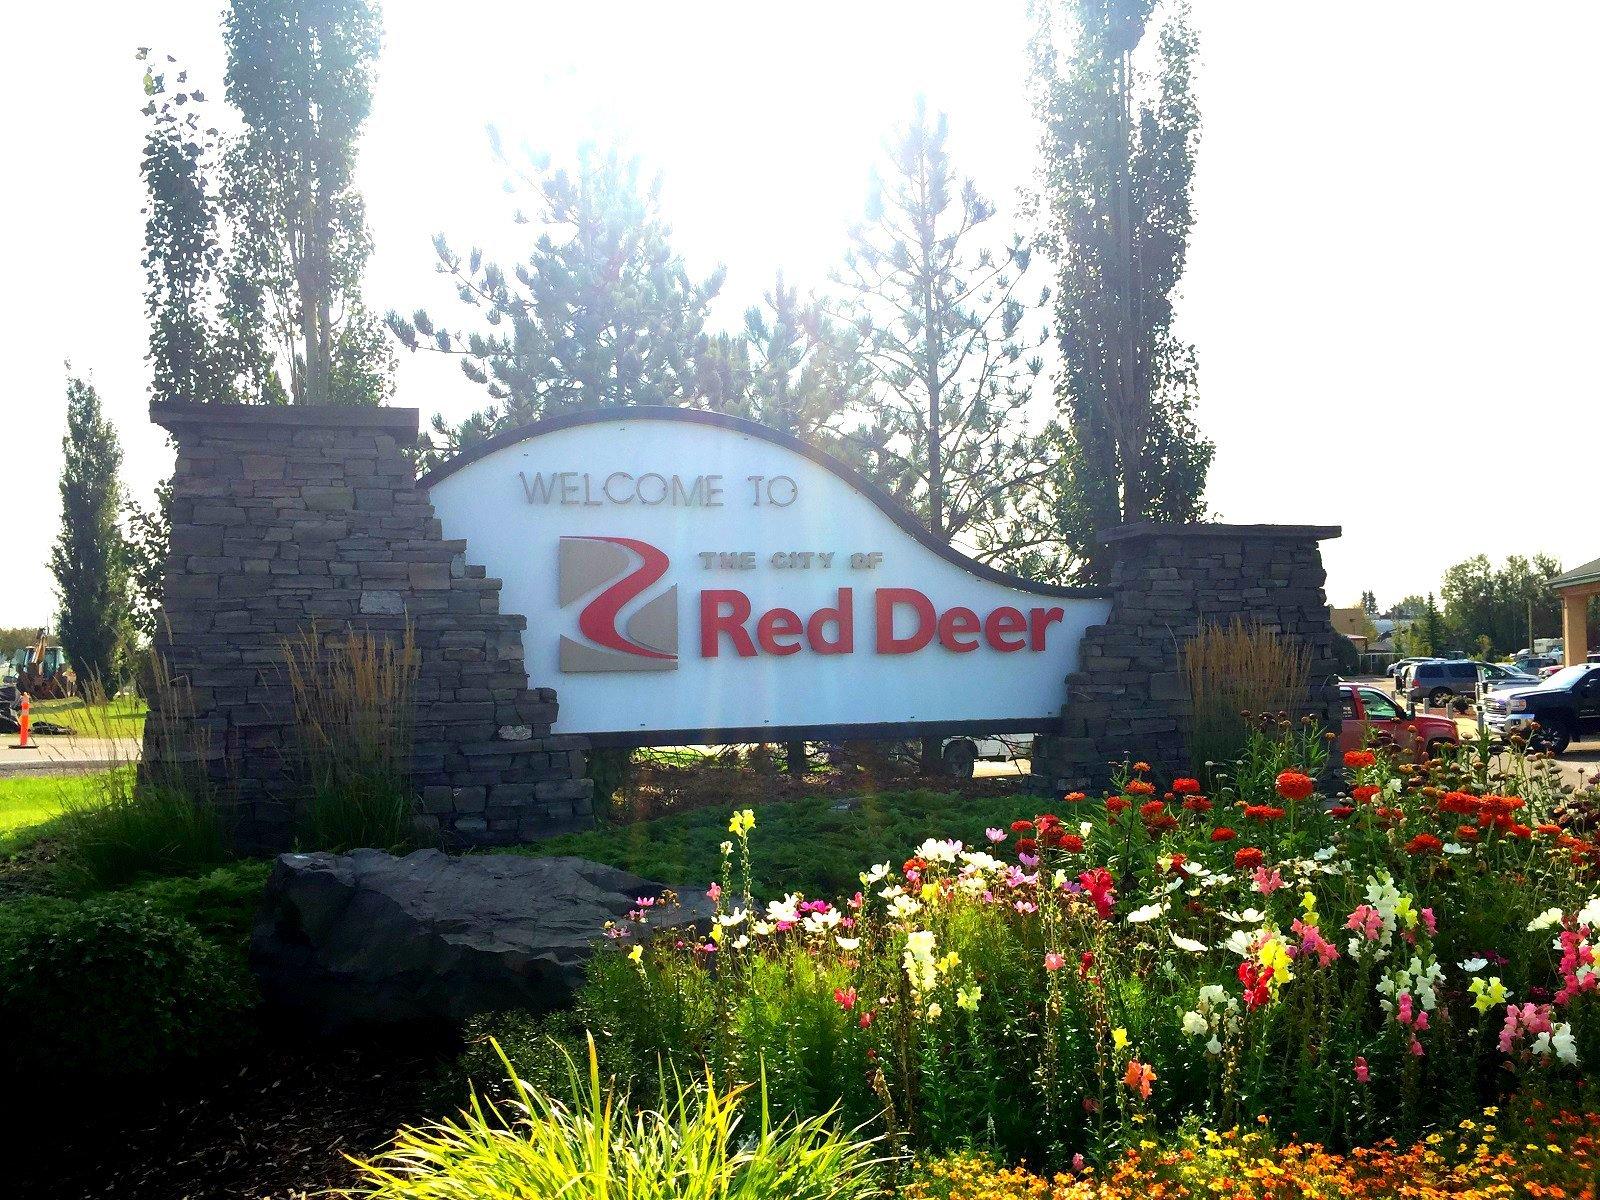 red deer alberta dating sites Free alberta dating site - alberta picture personals - alberta matchmaking service online dating in canada.